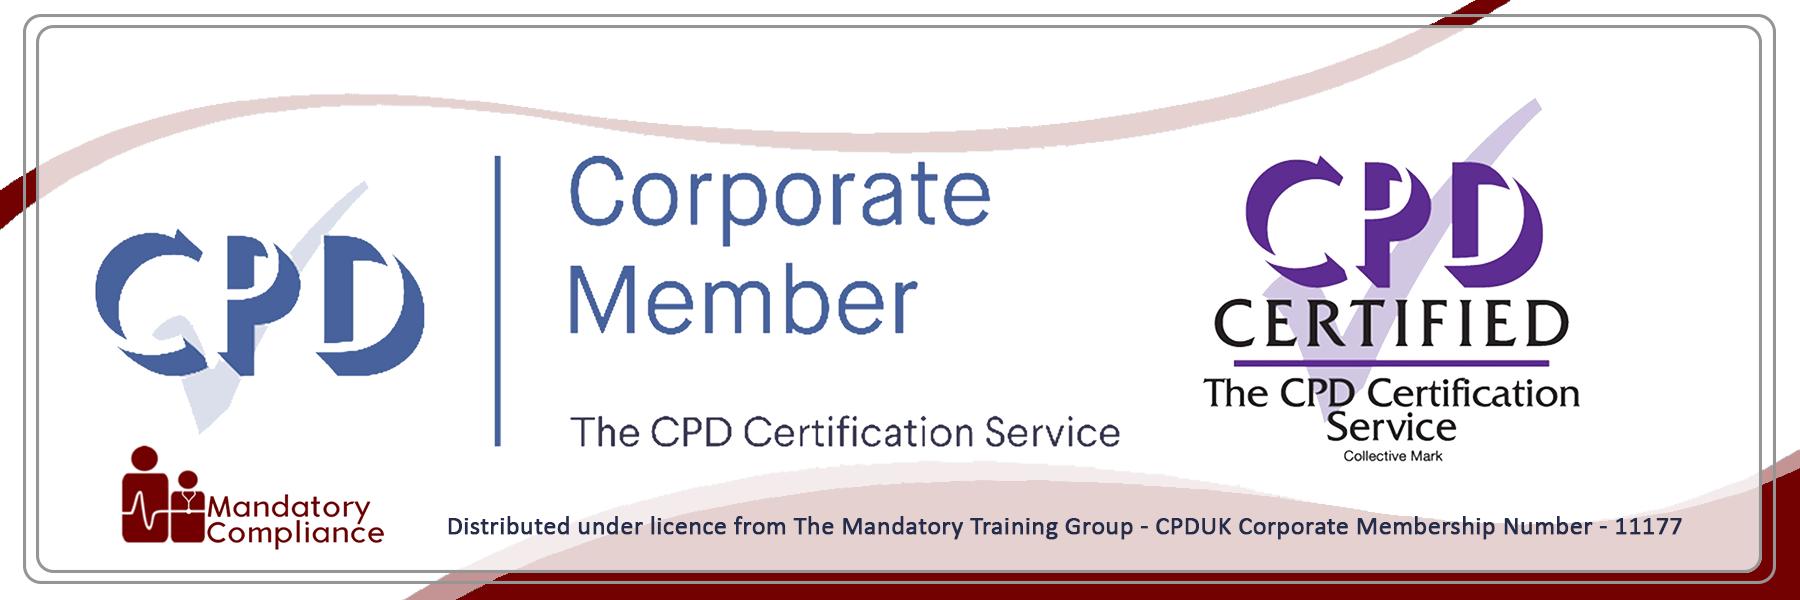 Clinical eLearning - Online Training Courses - Mandatory Compliance UK-